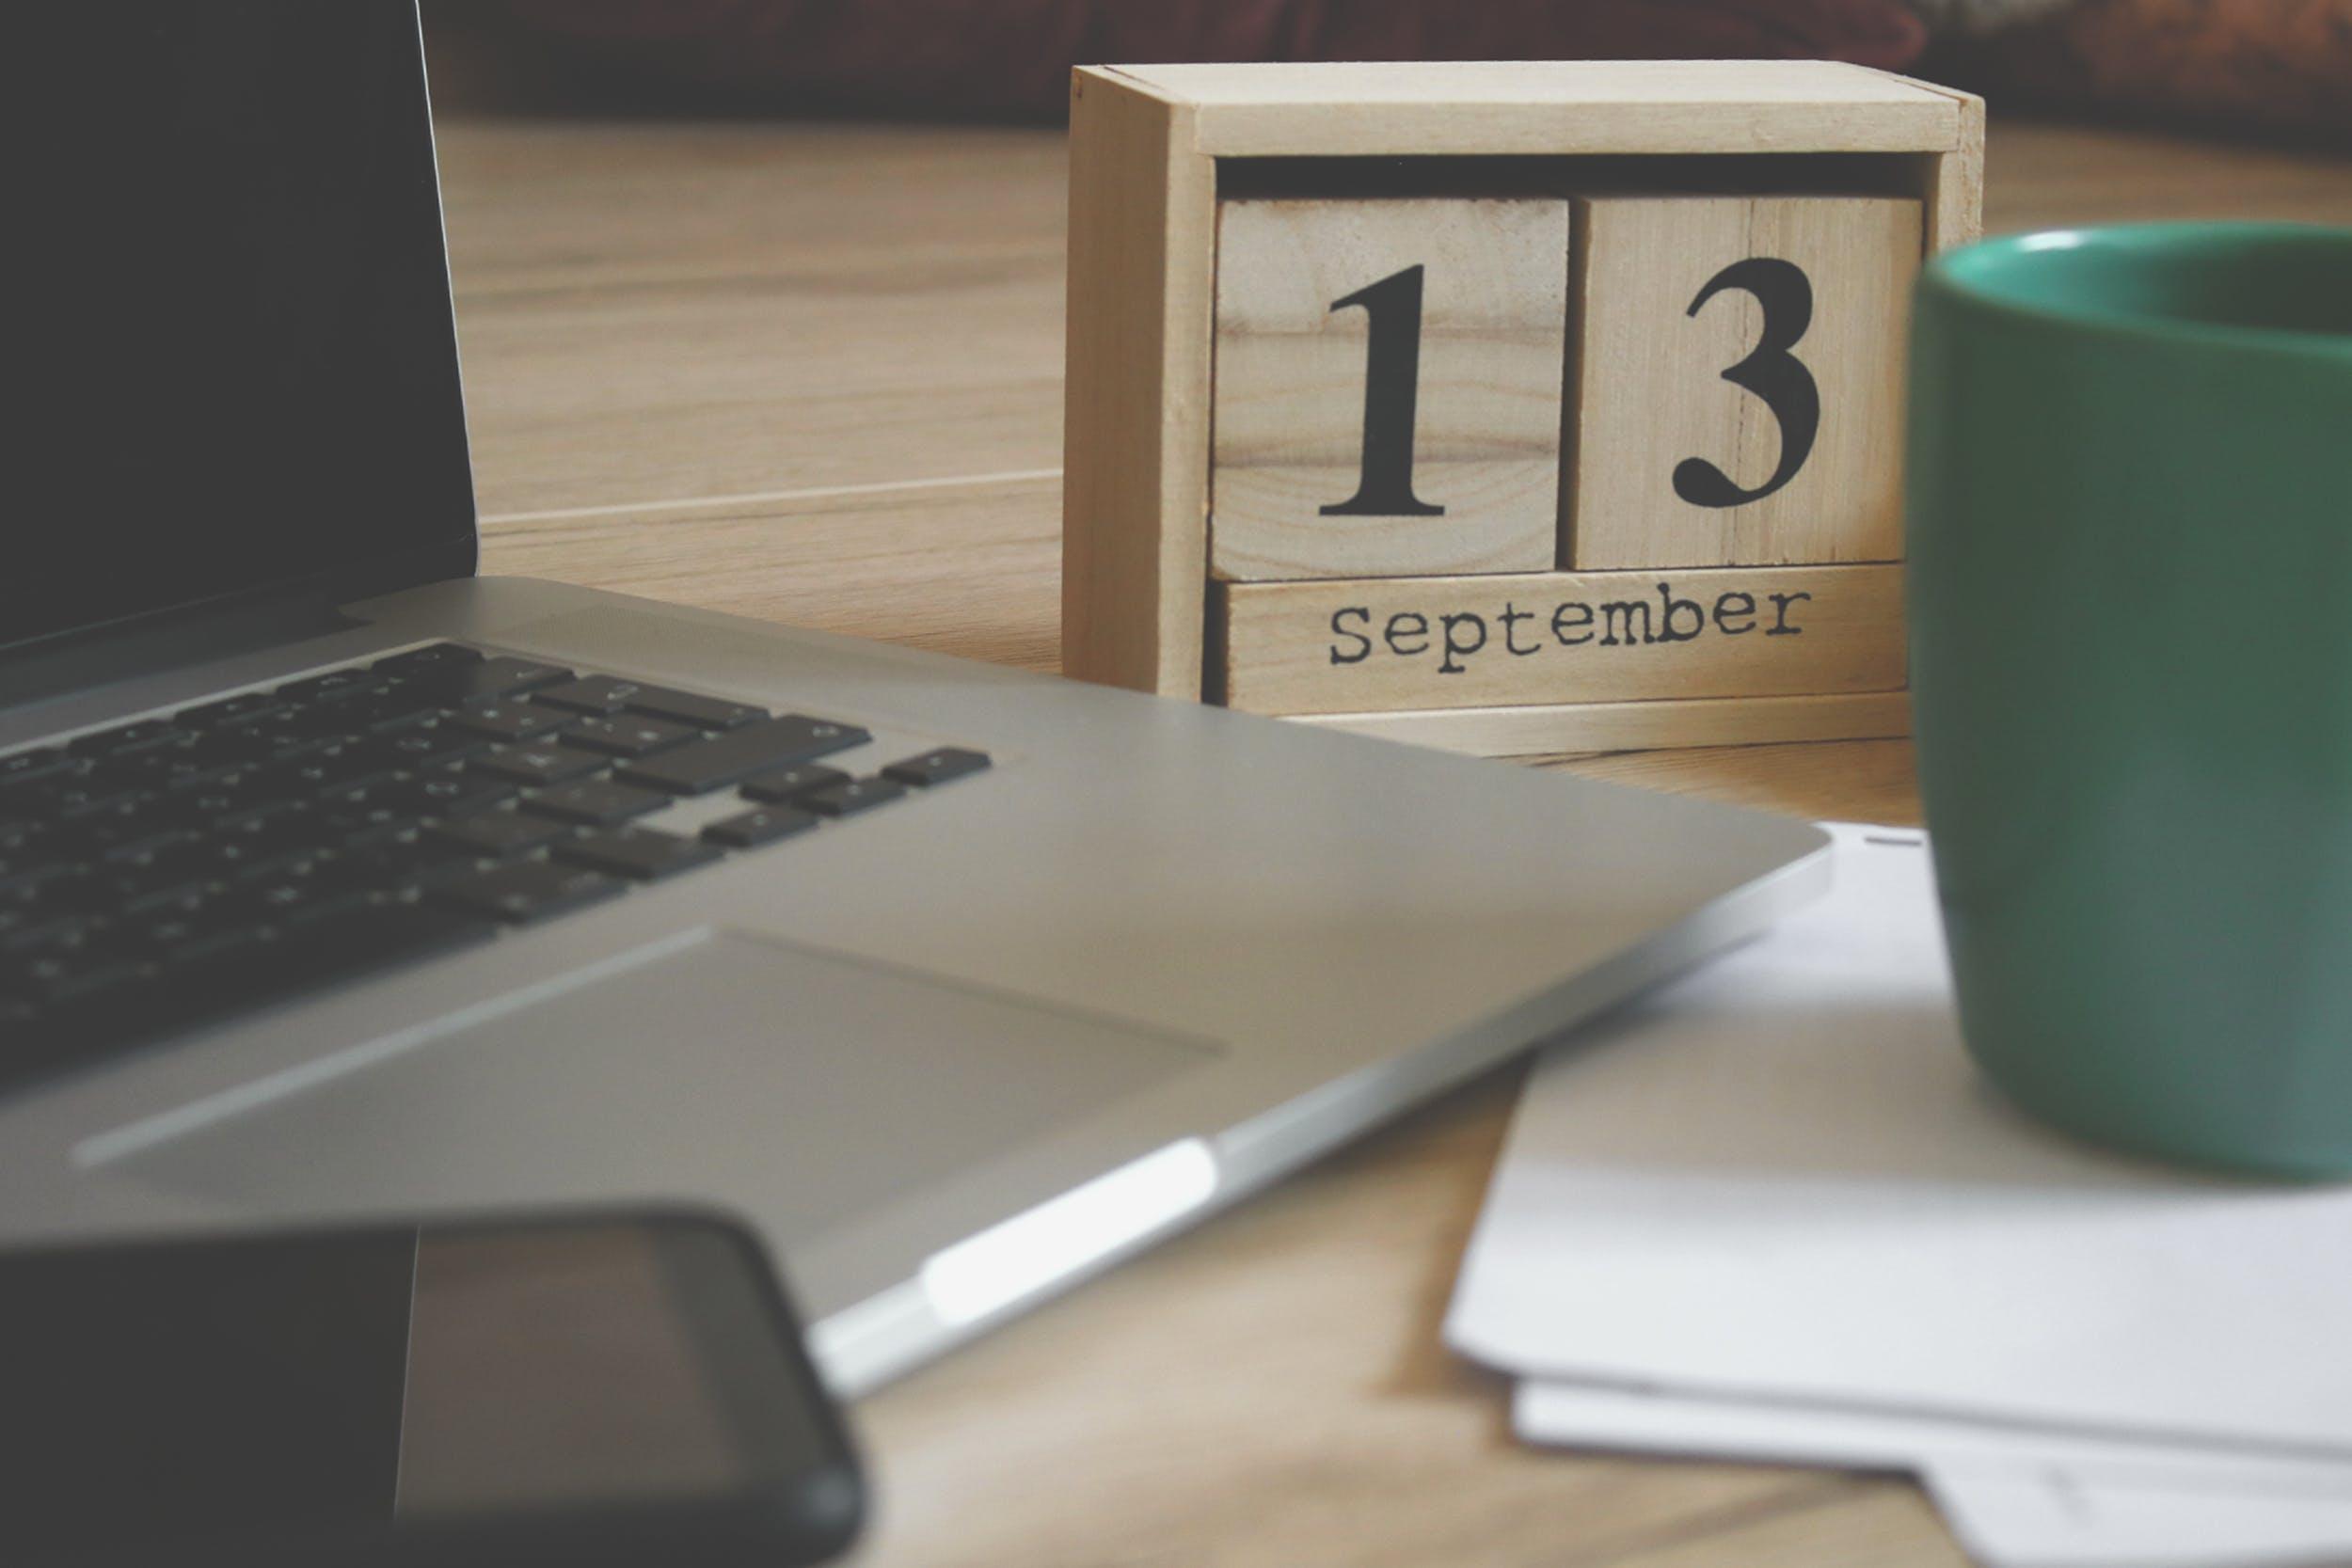 Brown Wooden Block Desk Calendar Displaying September 13